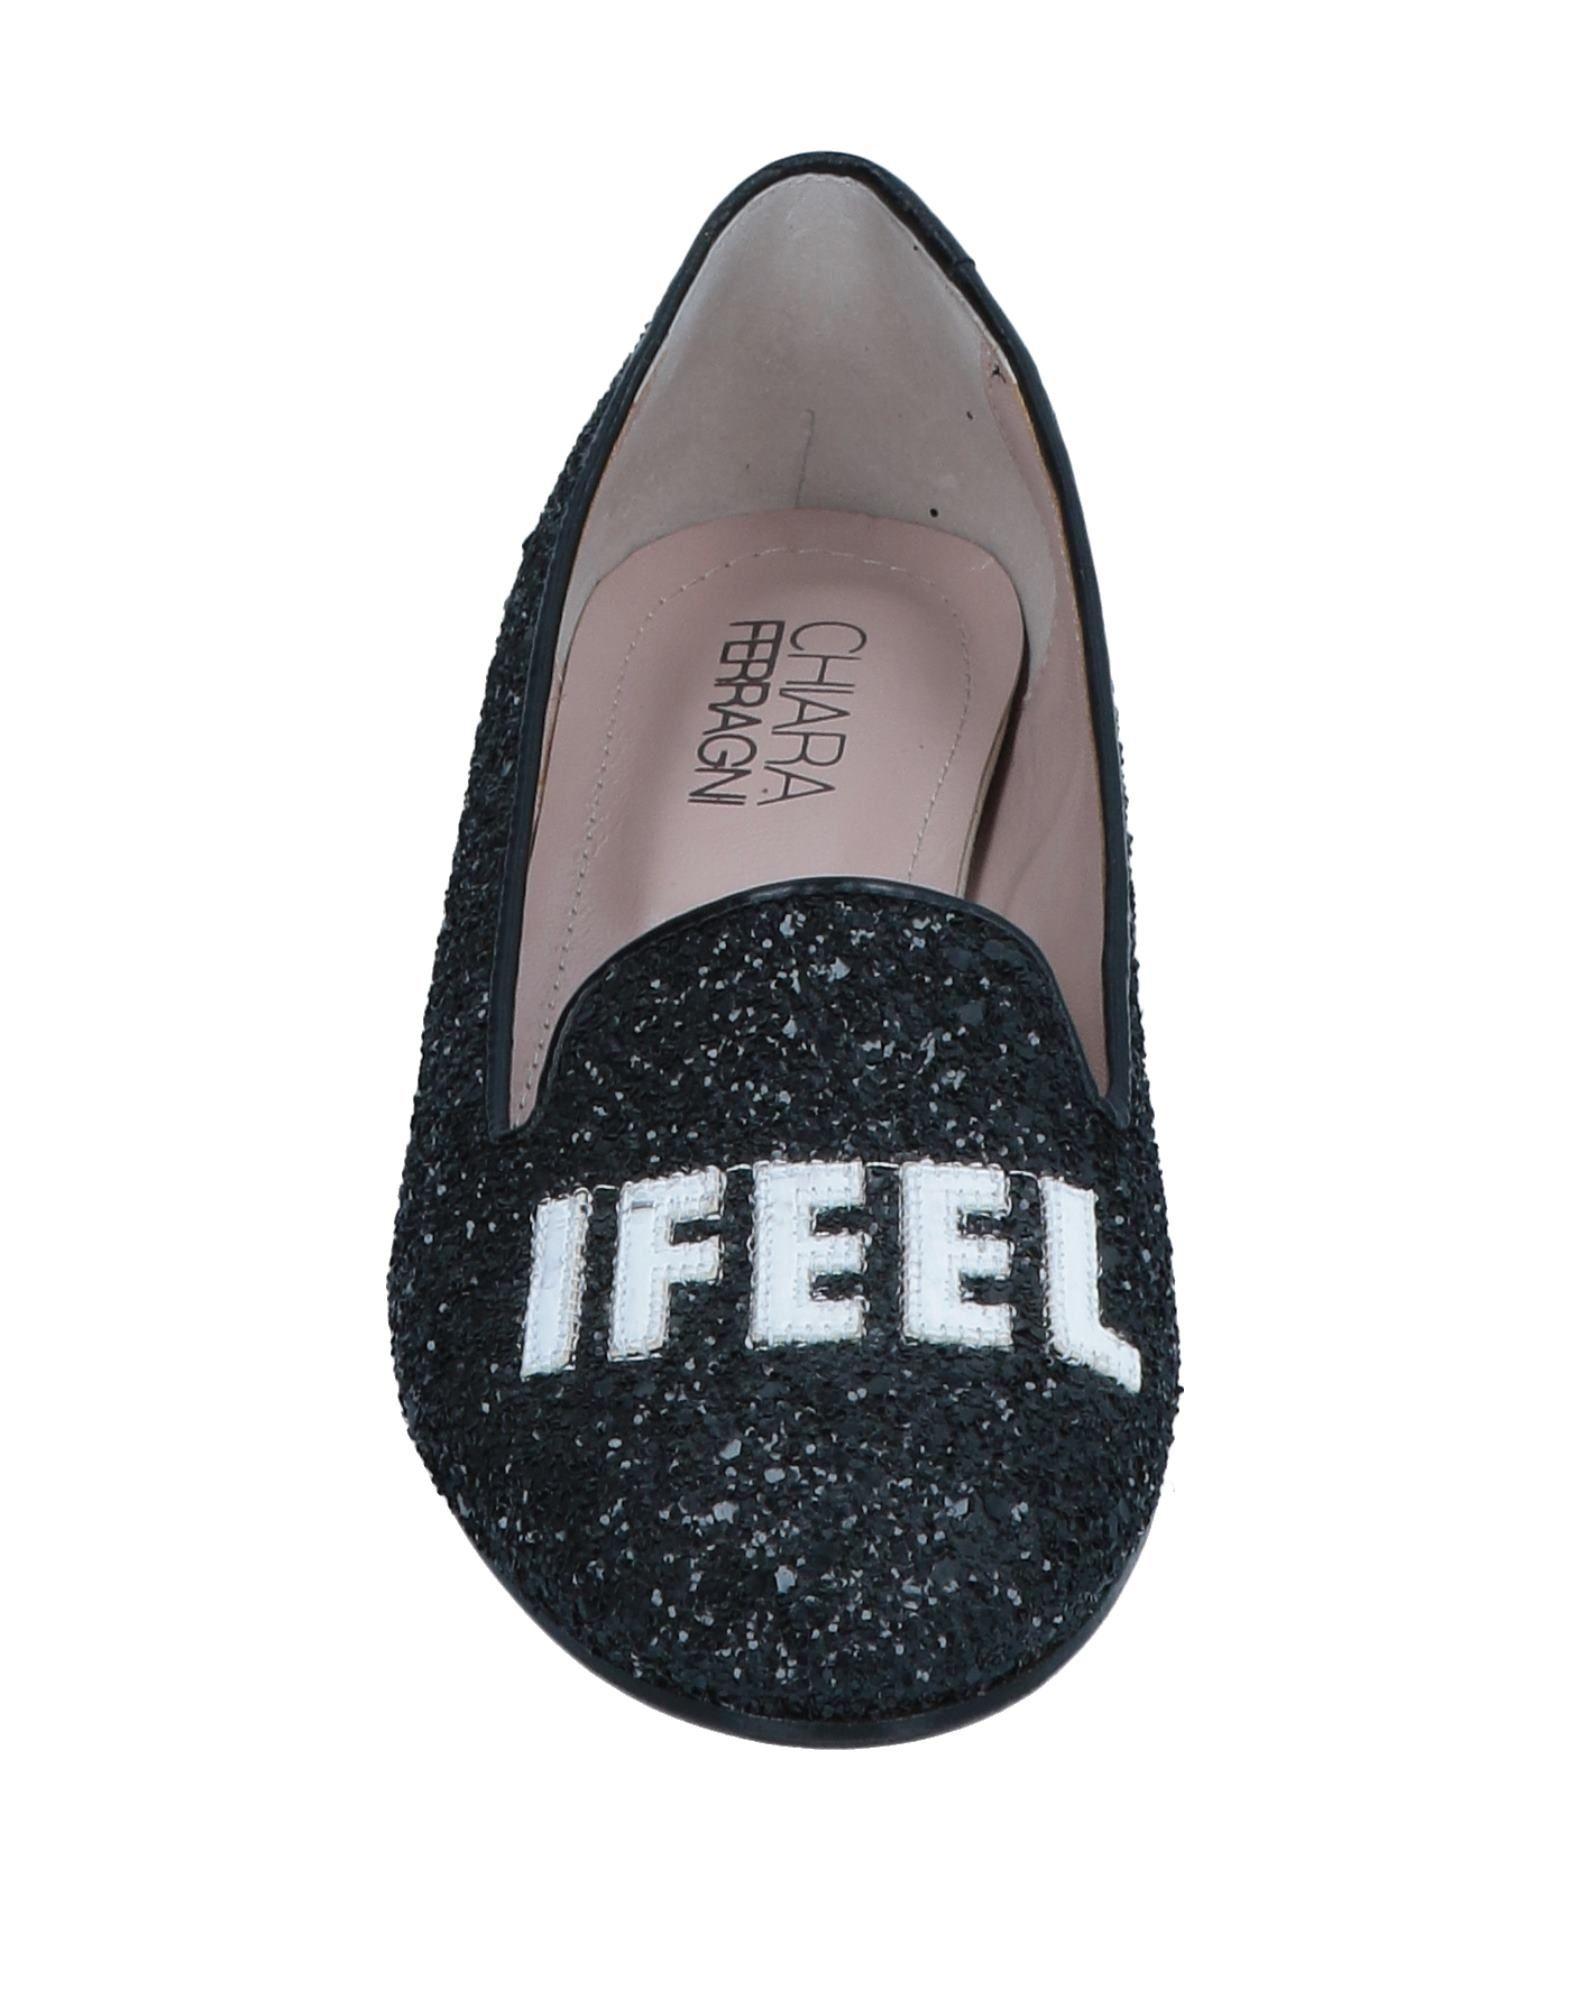 Chiara Ferragni Mokassins Damen  11554061MUGut aussehende strapazierfähige Schuhe